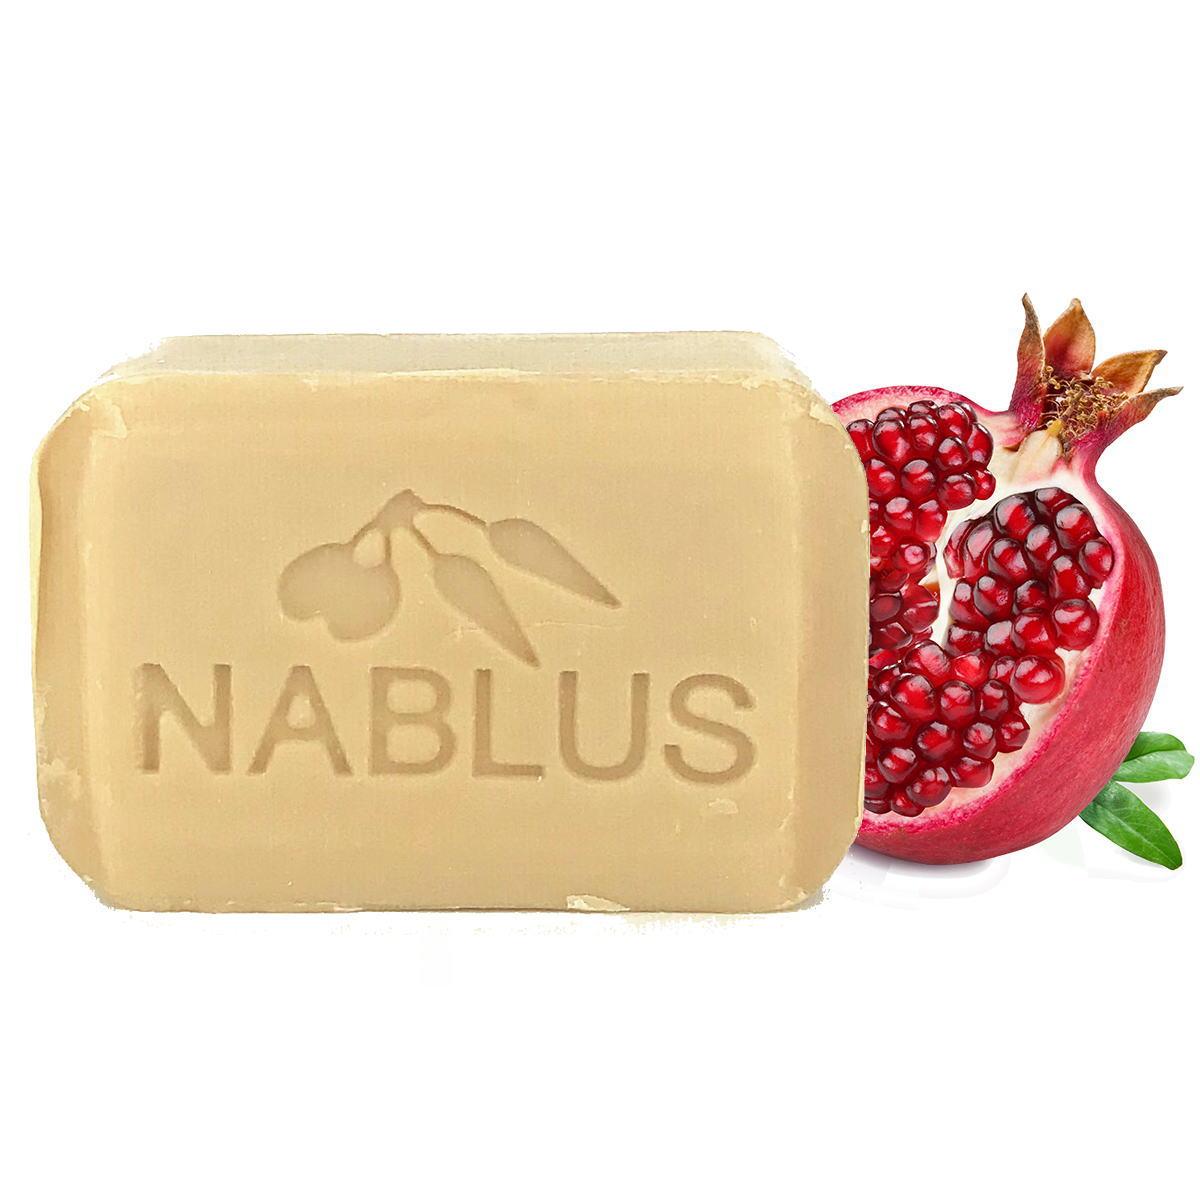 Nablus Soap ナーブルスソープ - ざくろ - 無添加 オーガニック石鹸